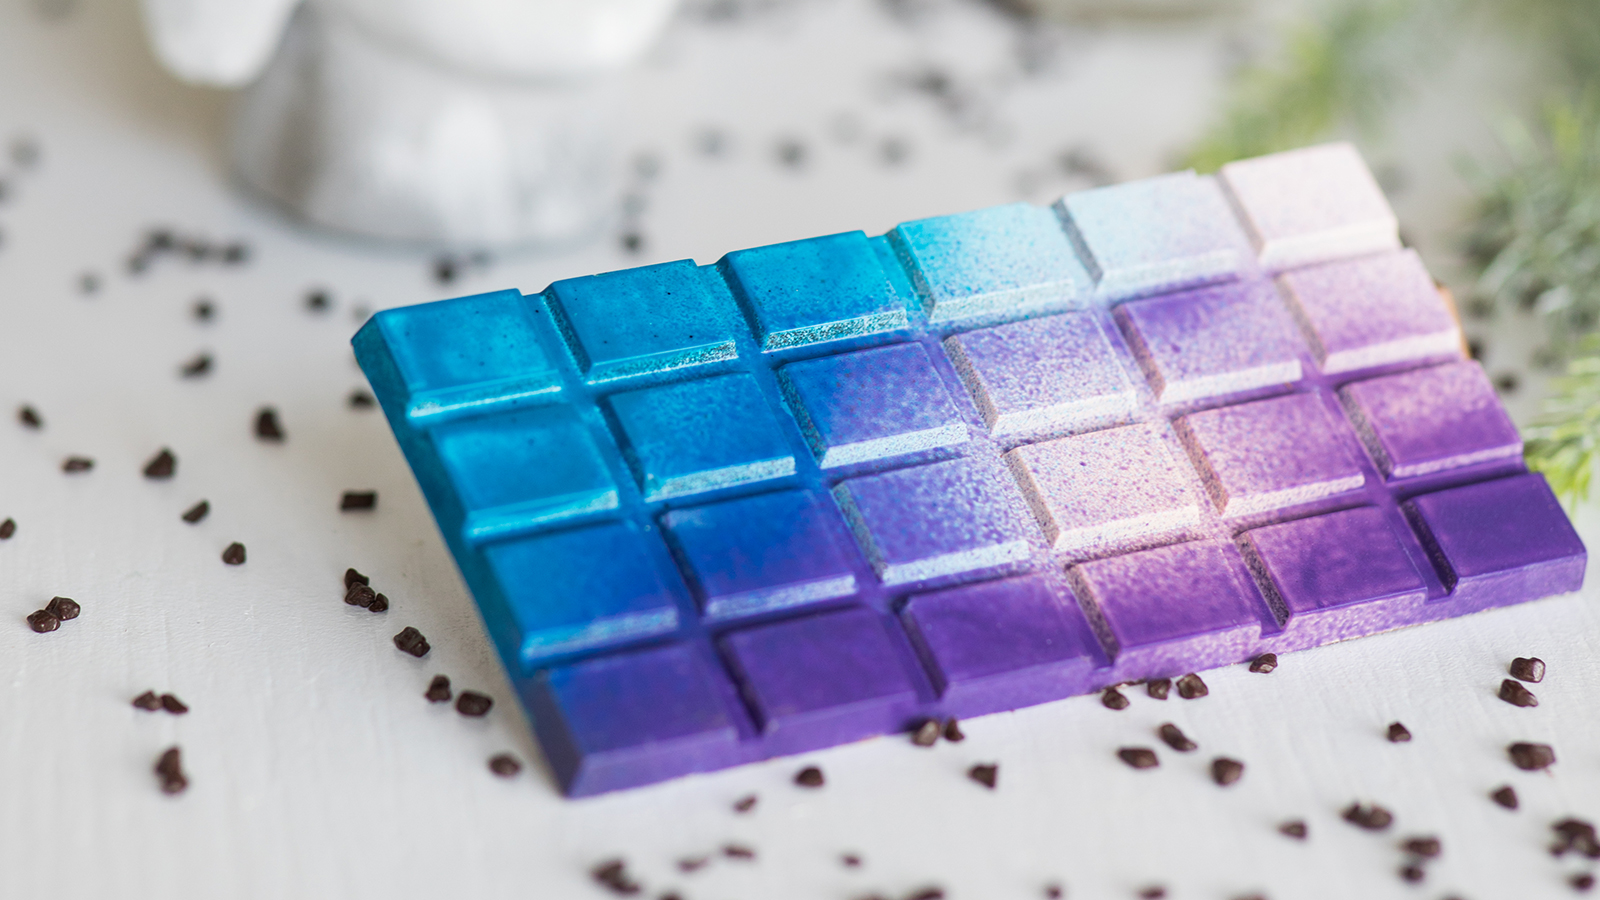 ChocoChocolat_CadeauxCorpo_Banniere1600x900_CarrefourSantePrairies